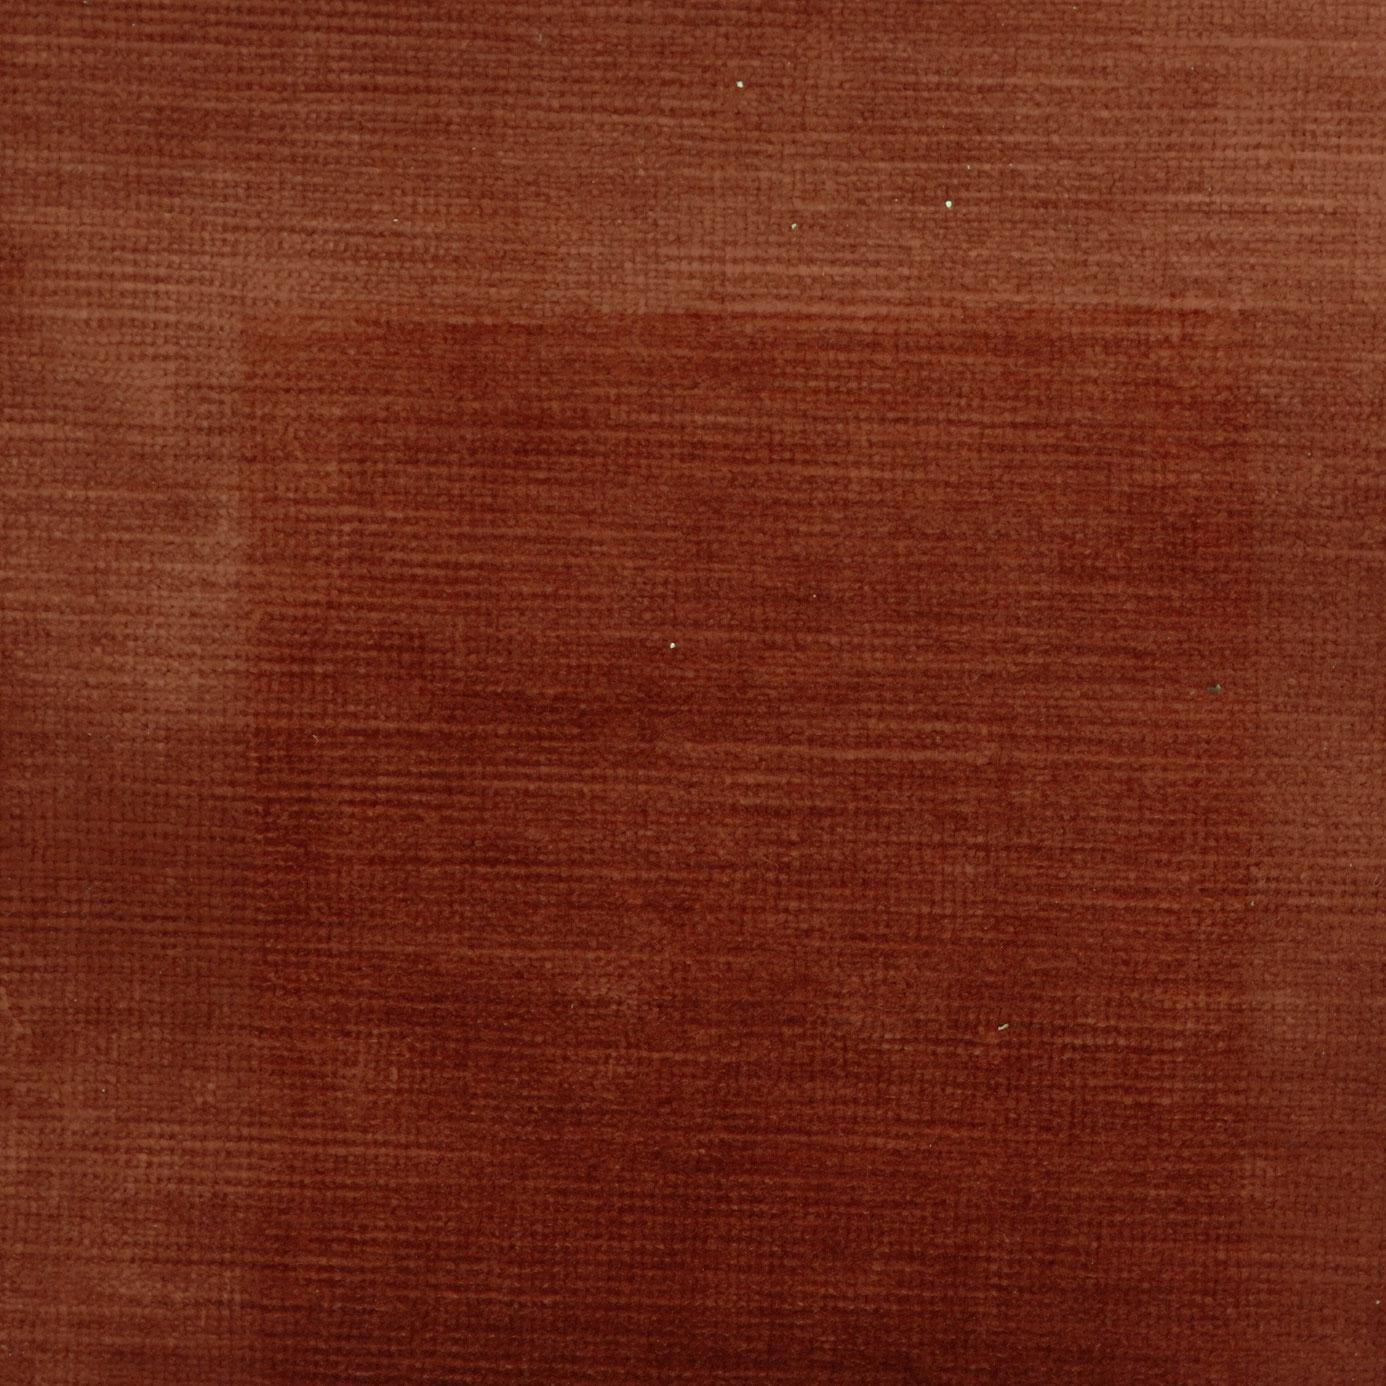 Majestic Velvets Fabric Copper F0128 11 Clarke